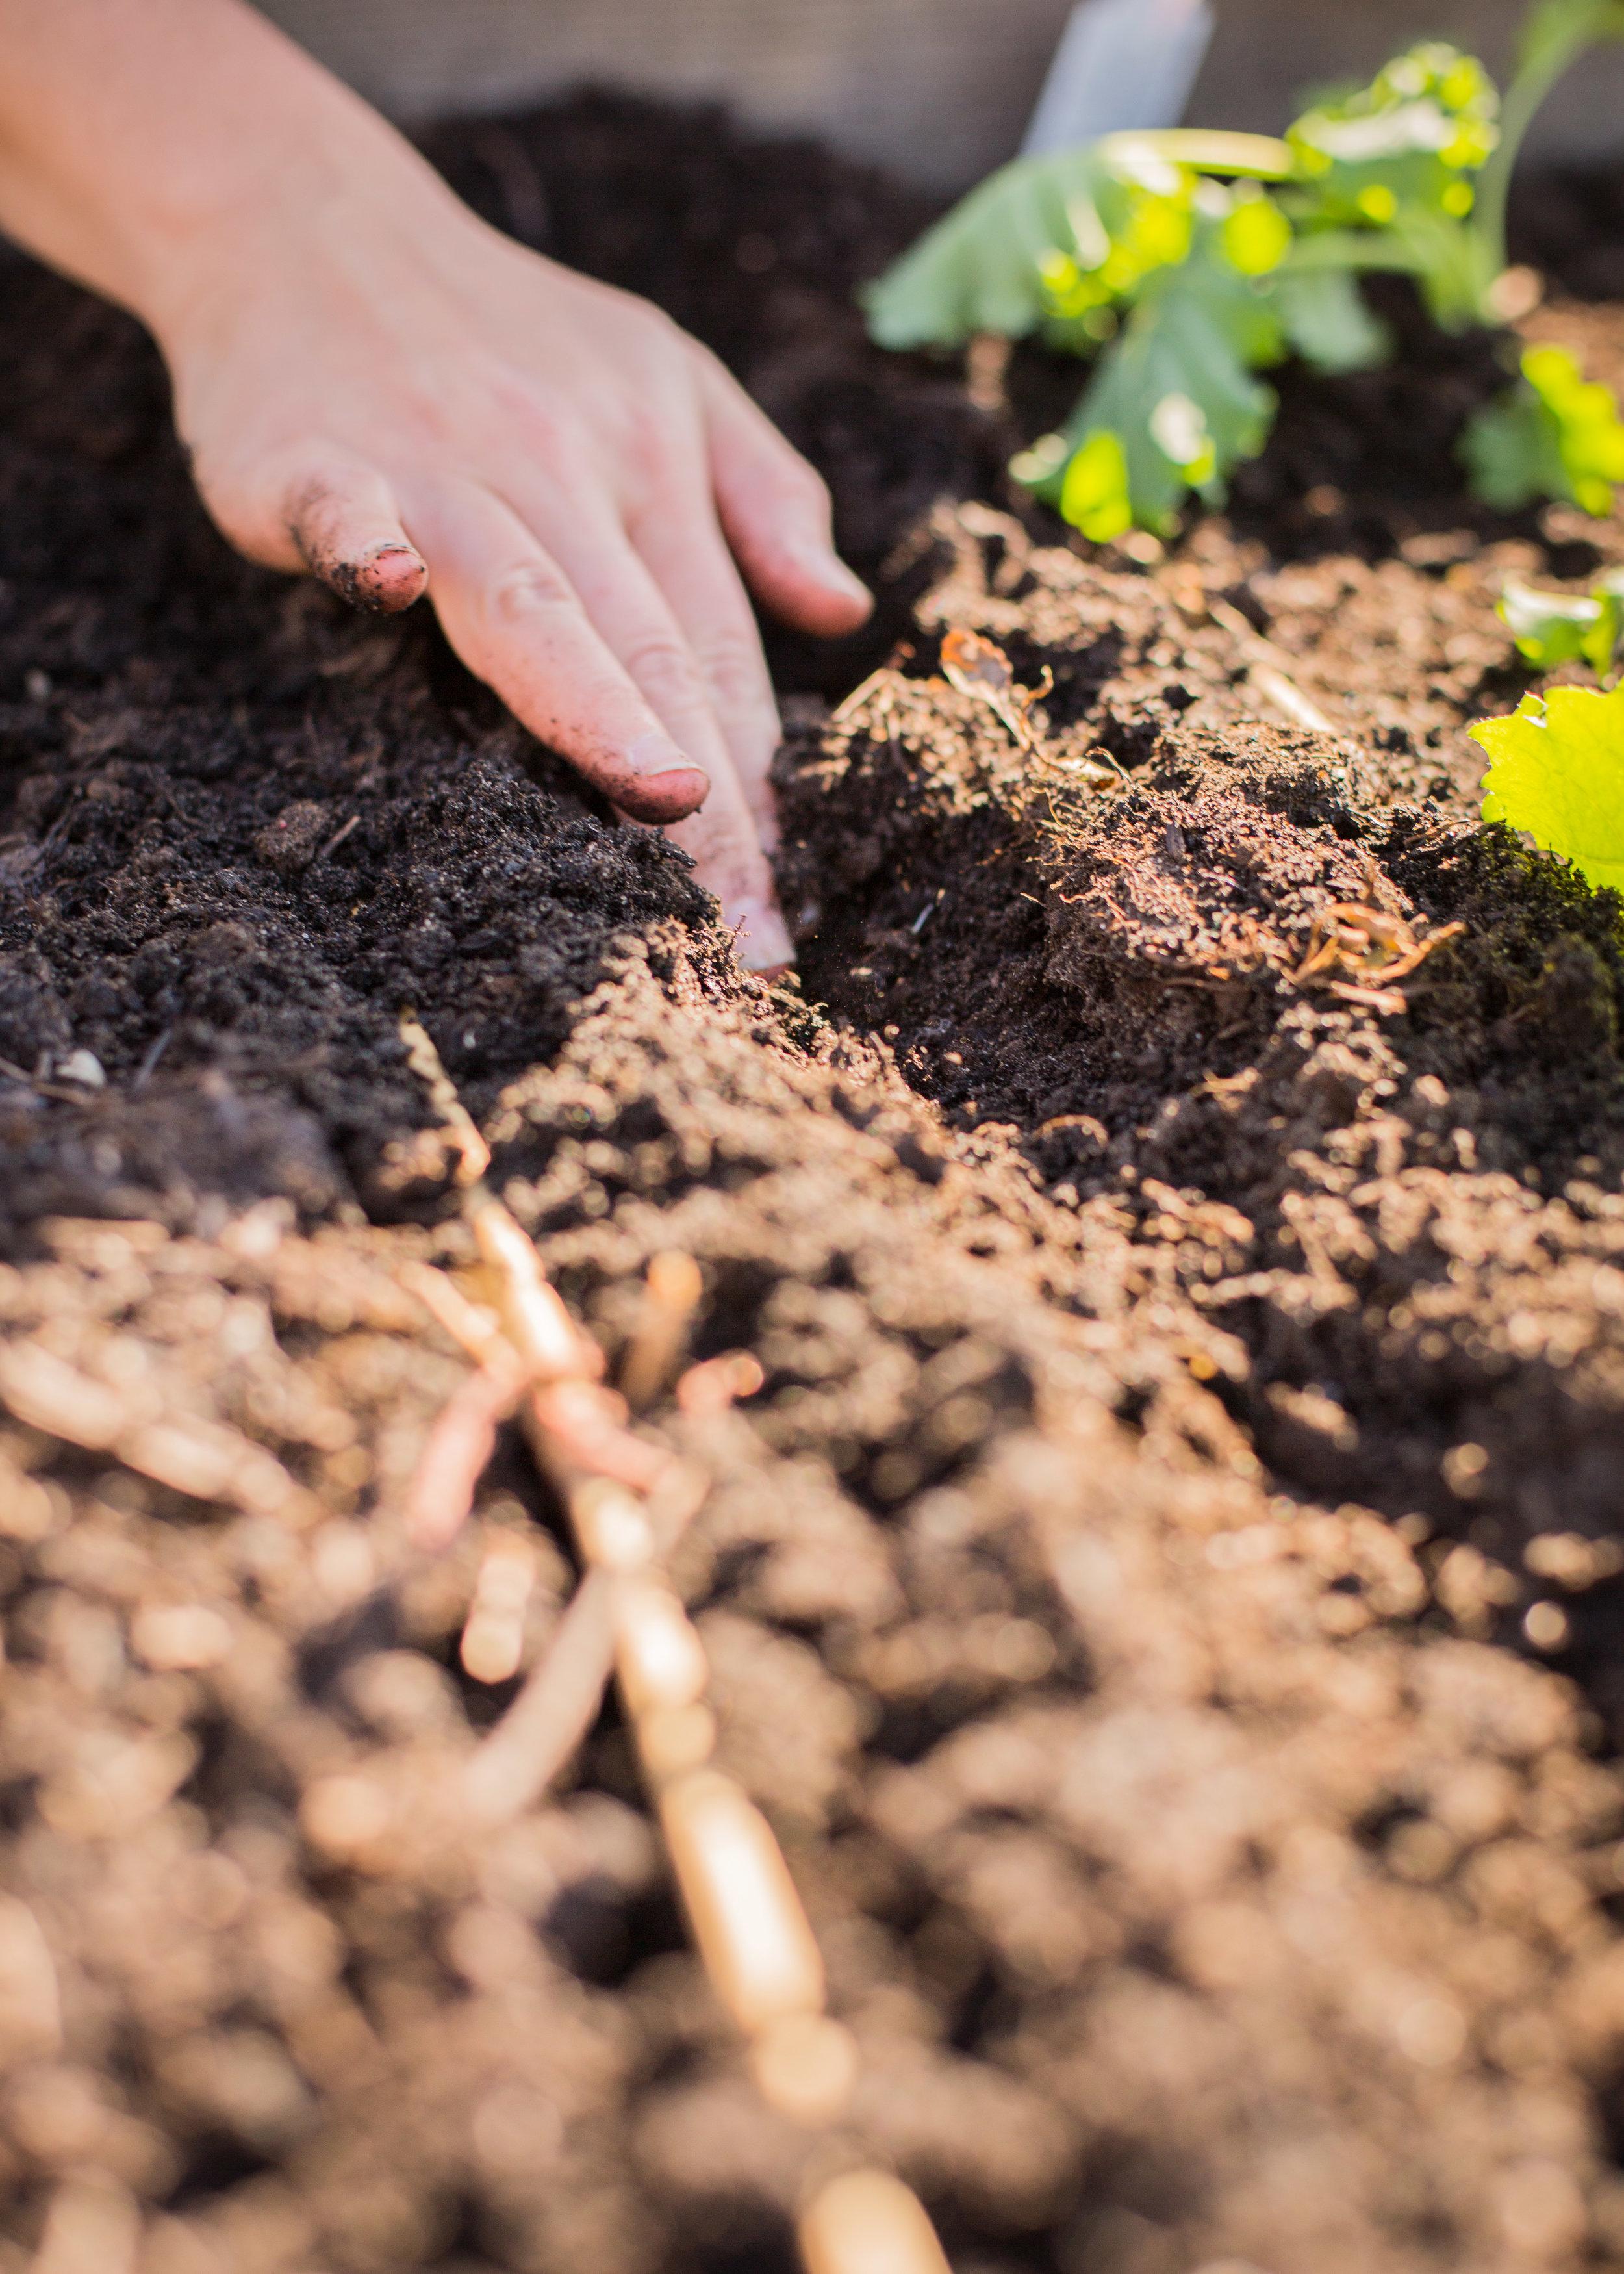 Raised_Garden_Bed_The_Drive_Temporary_Community_Garden_04.2016_Shifting_Growth_022.jpg